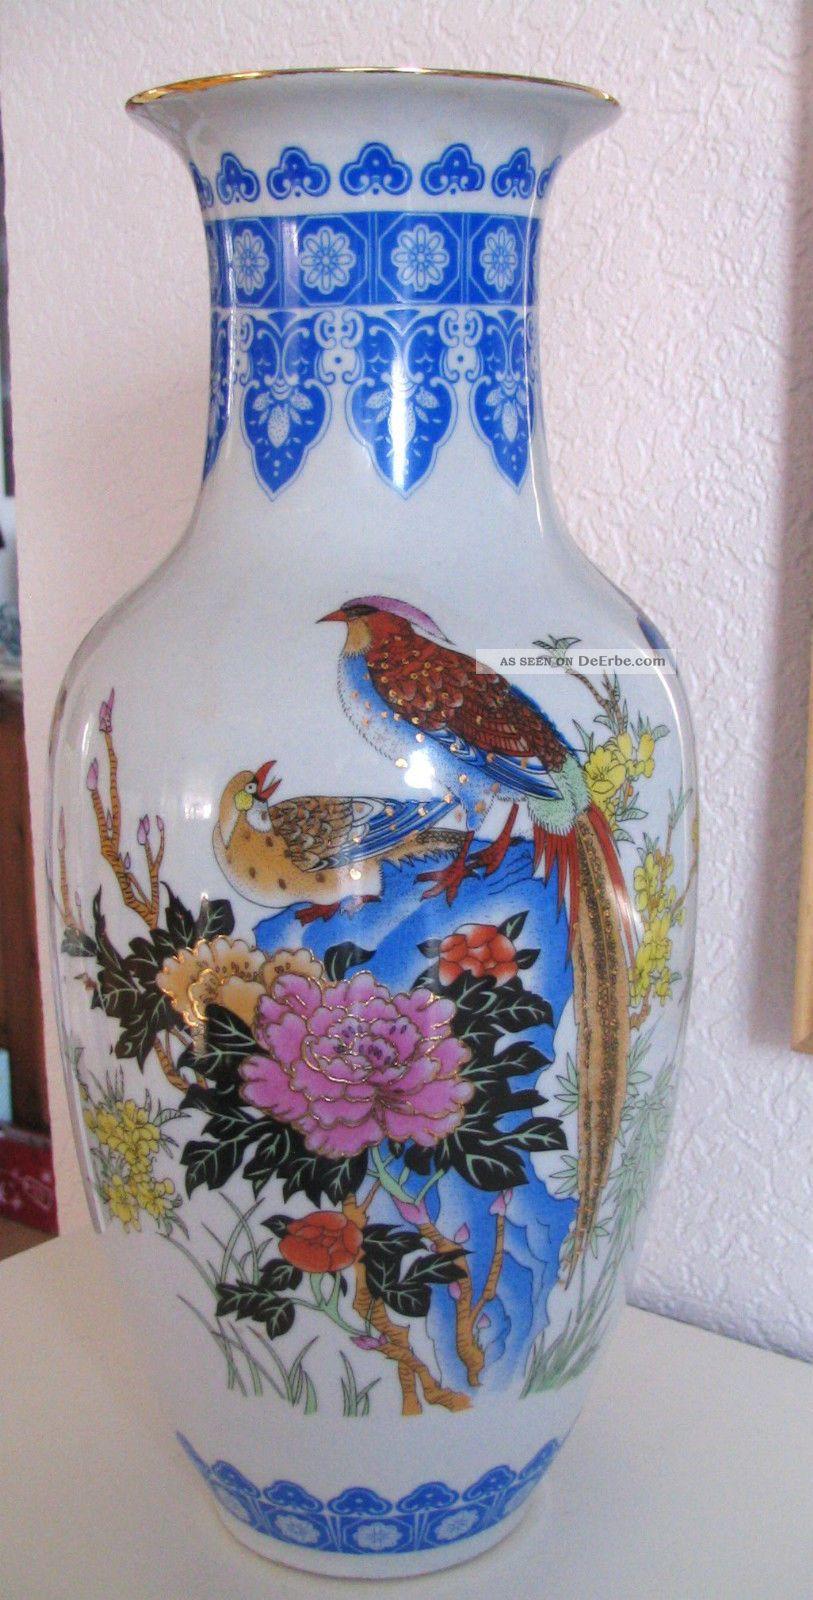 asiatische vase blumen vogel dekor handgemalt 36cm porzellan. Black Bedroom Furniture Sets. Home Design Ideas